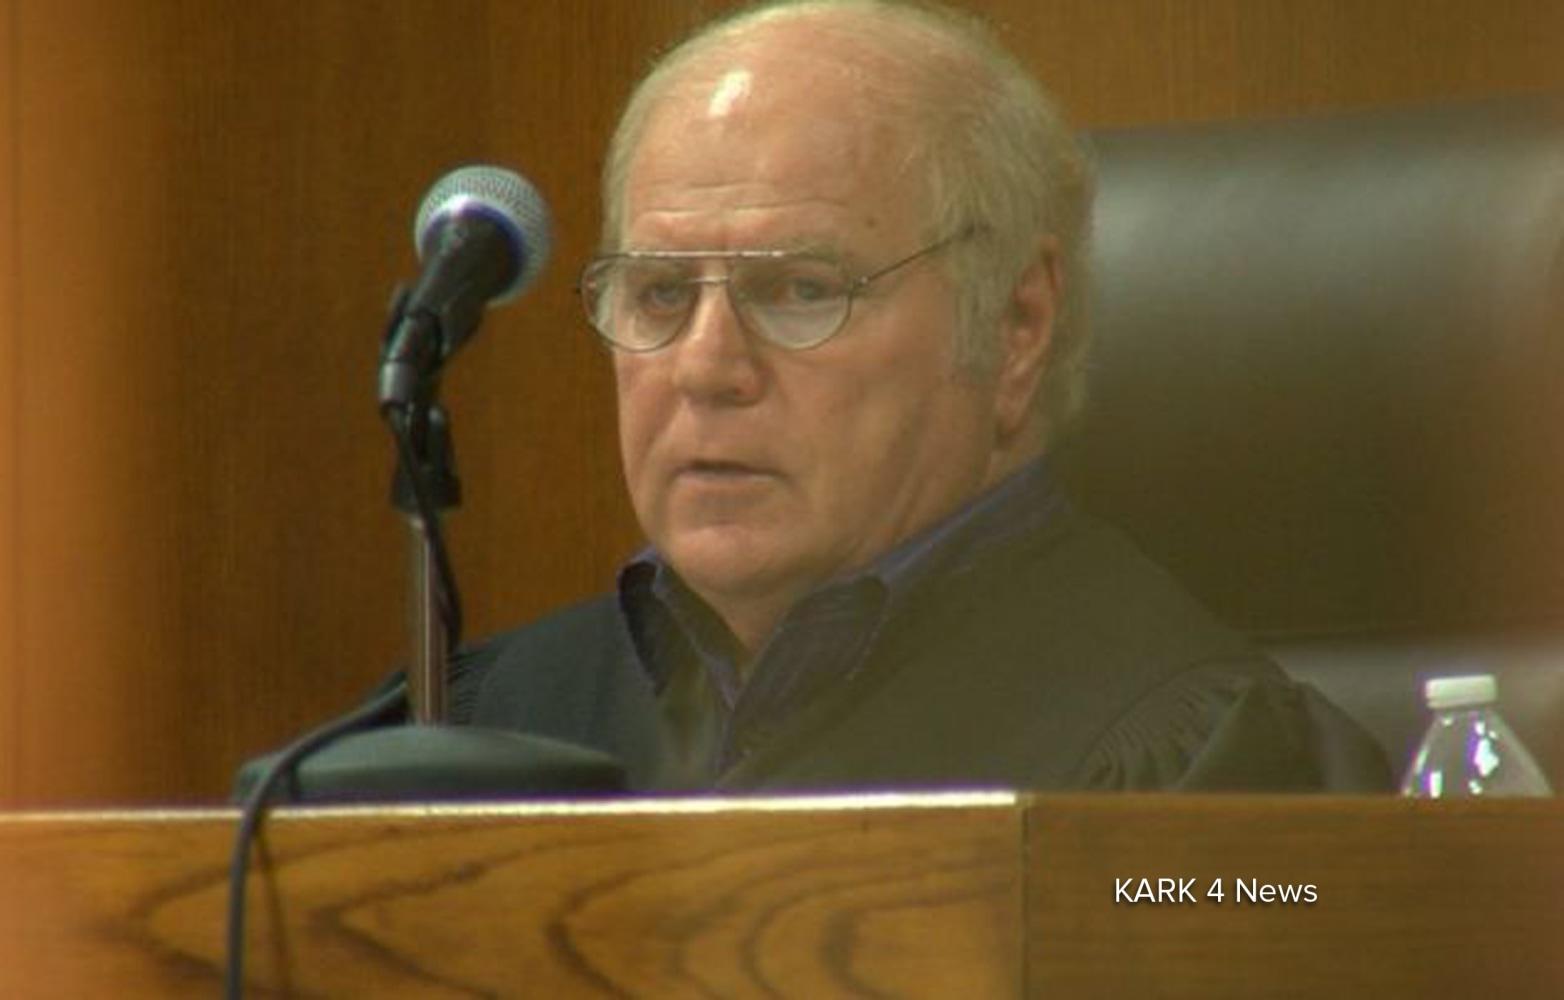 Arkansas Judge Resigns After Thousands of Nude Photos of ...